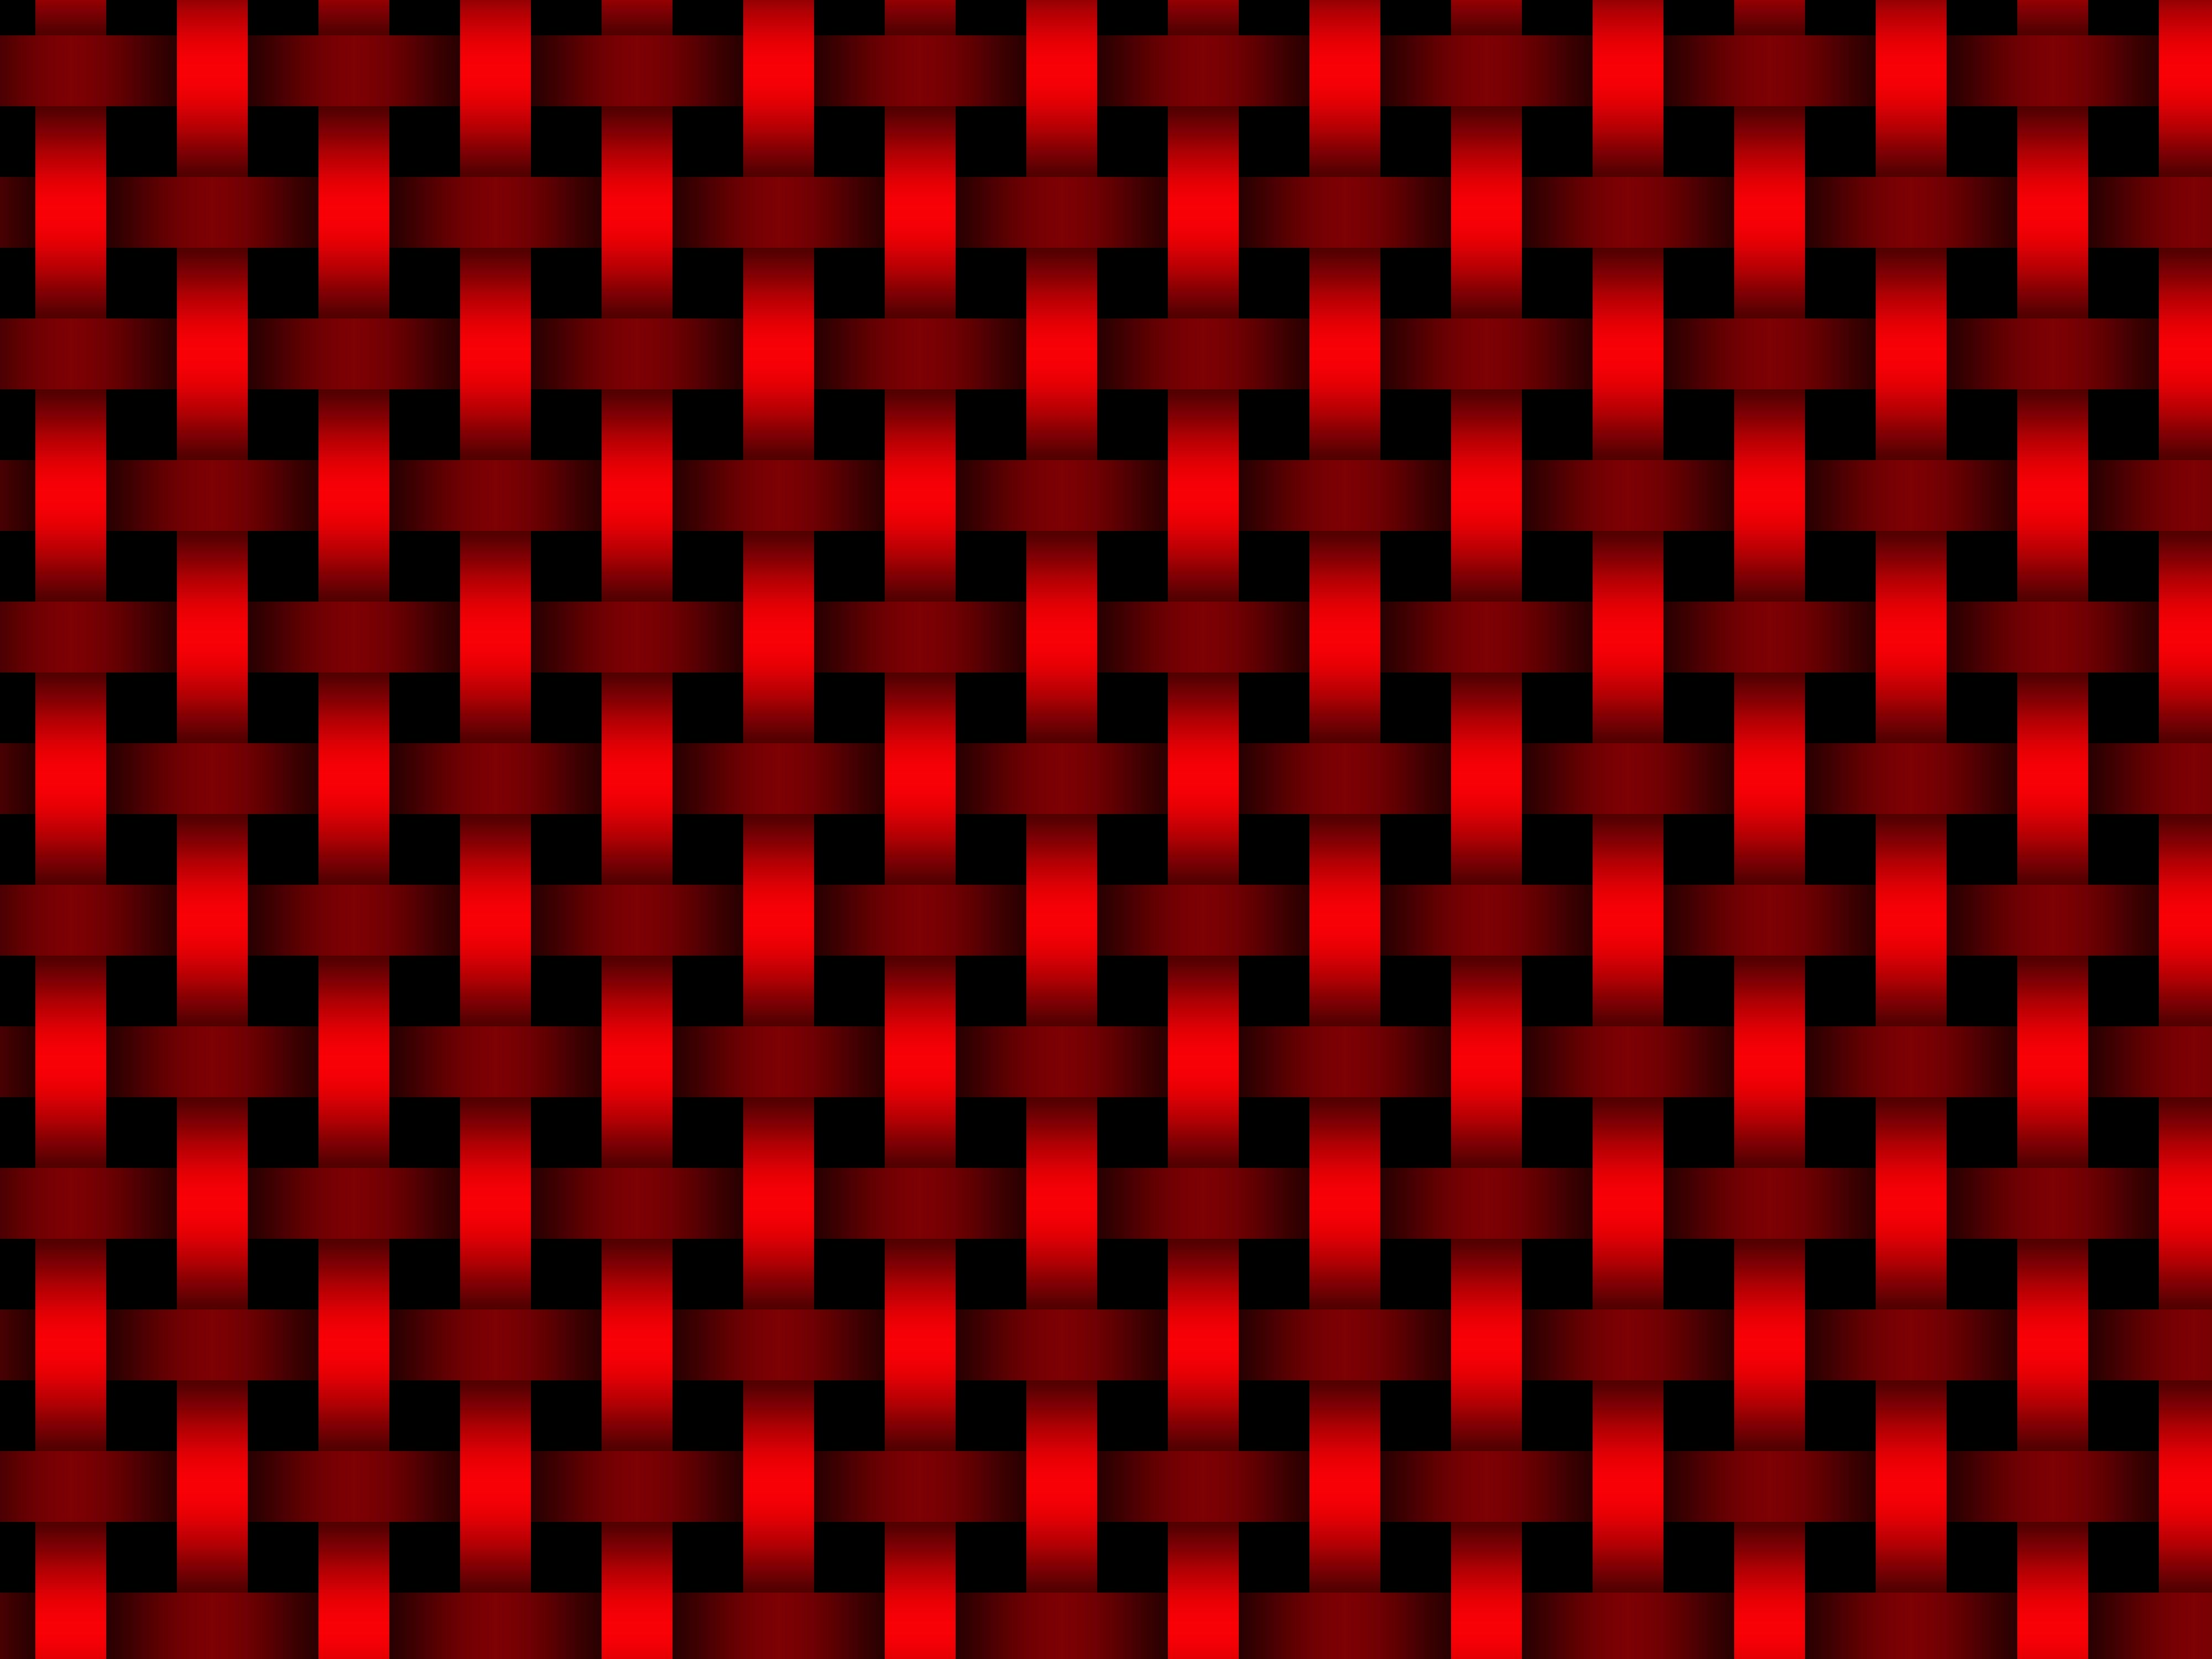 Red Carbon Fiber Wallpapers Top Free Red Carbon Fiber